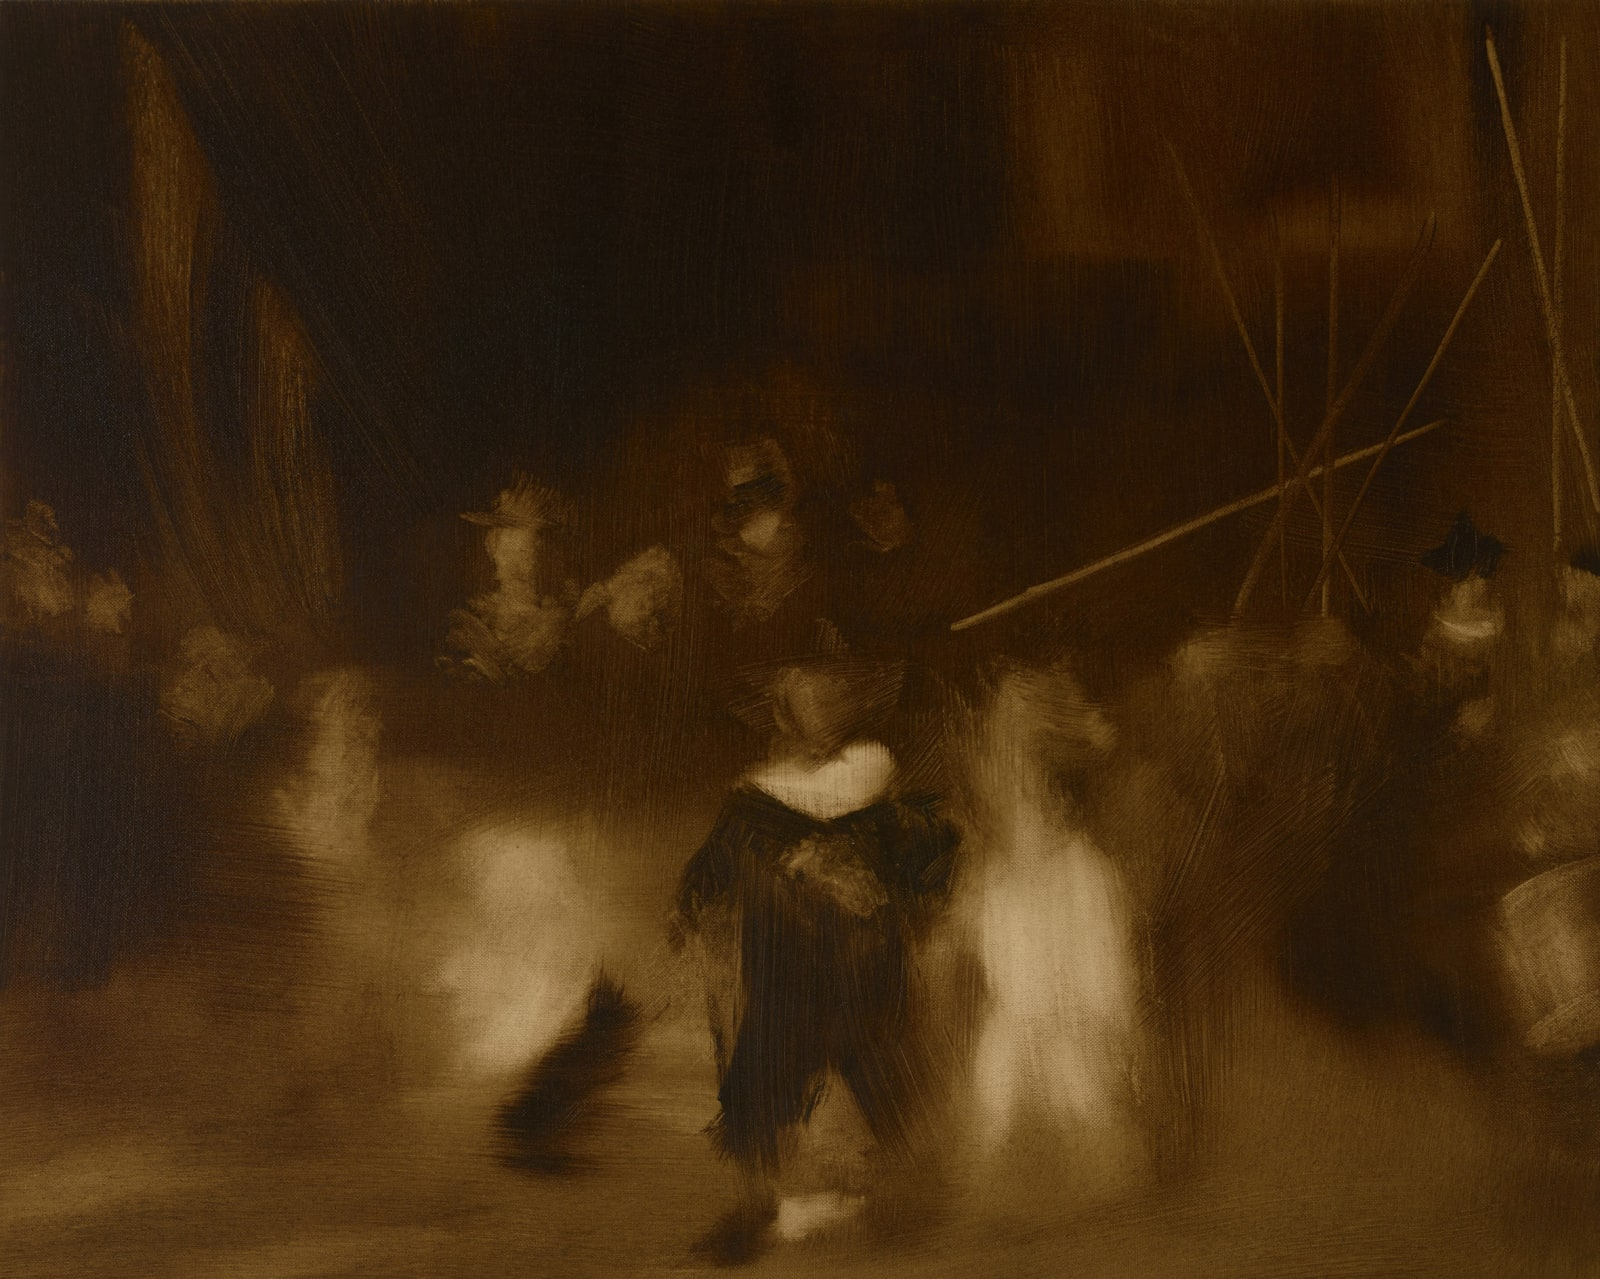 Medium Study I for Night Watch oil on canvas 61cm x 76cm (24